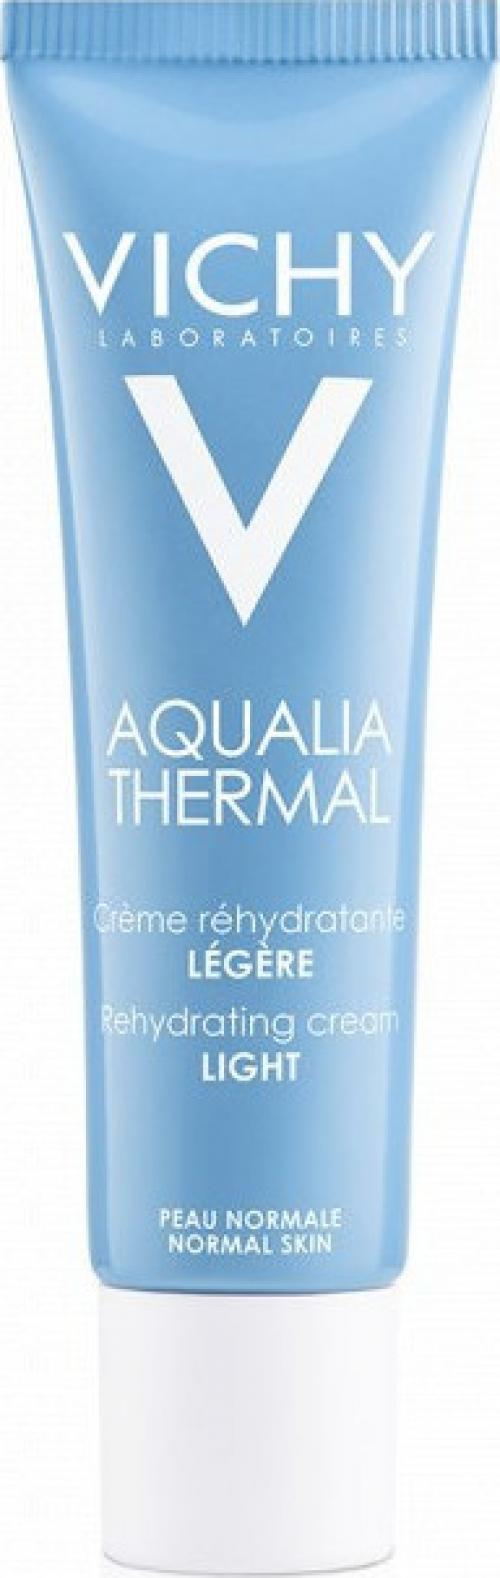 Vichy Aqualia Thermal Rehydrating Light Cream for Normal Skin 30ml